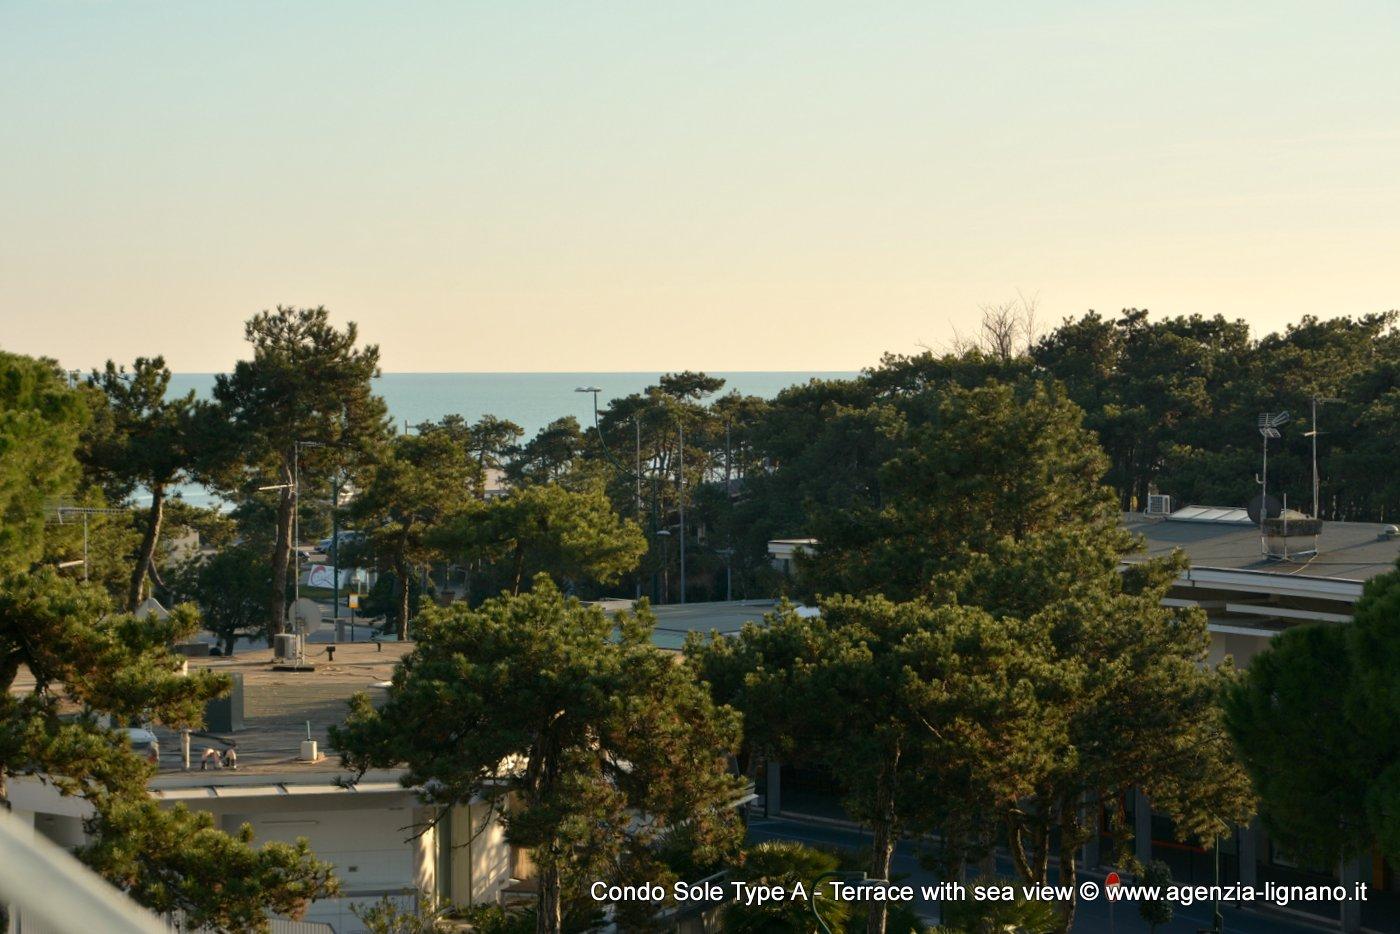 Lignano Pineta With Sea View Apartments For Rent In Lignano Sabbiadoro Friuli Venezia Giulia Italy